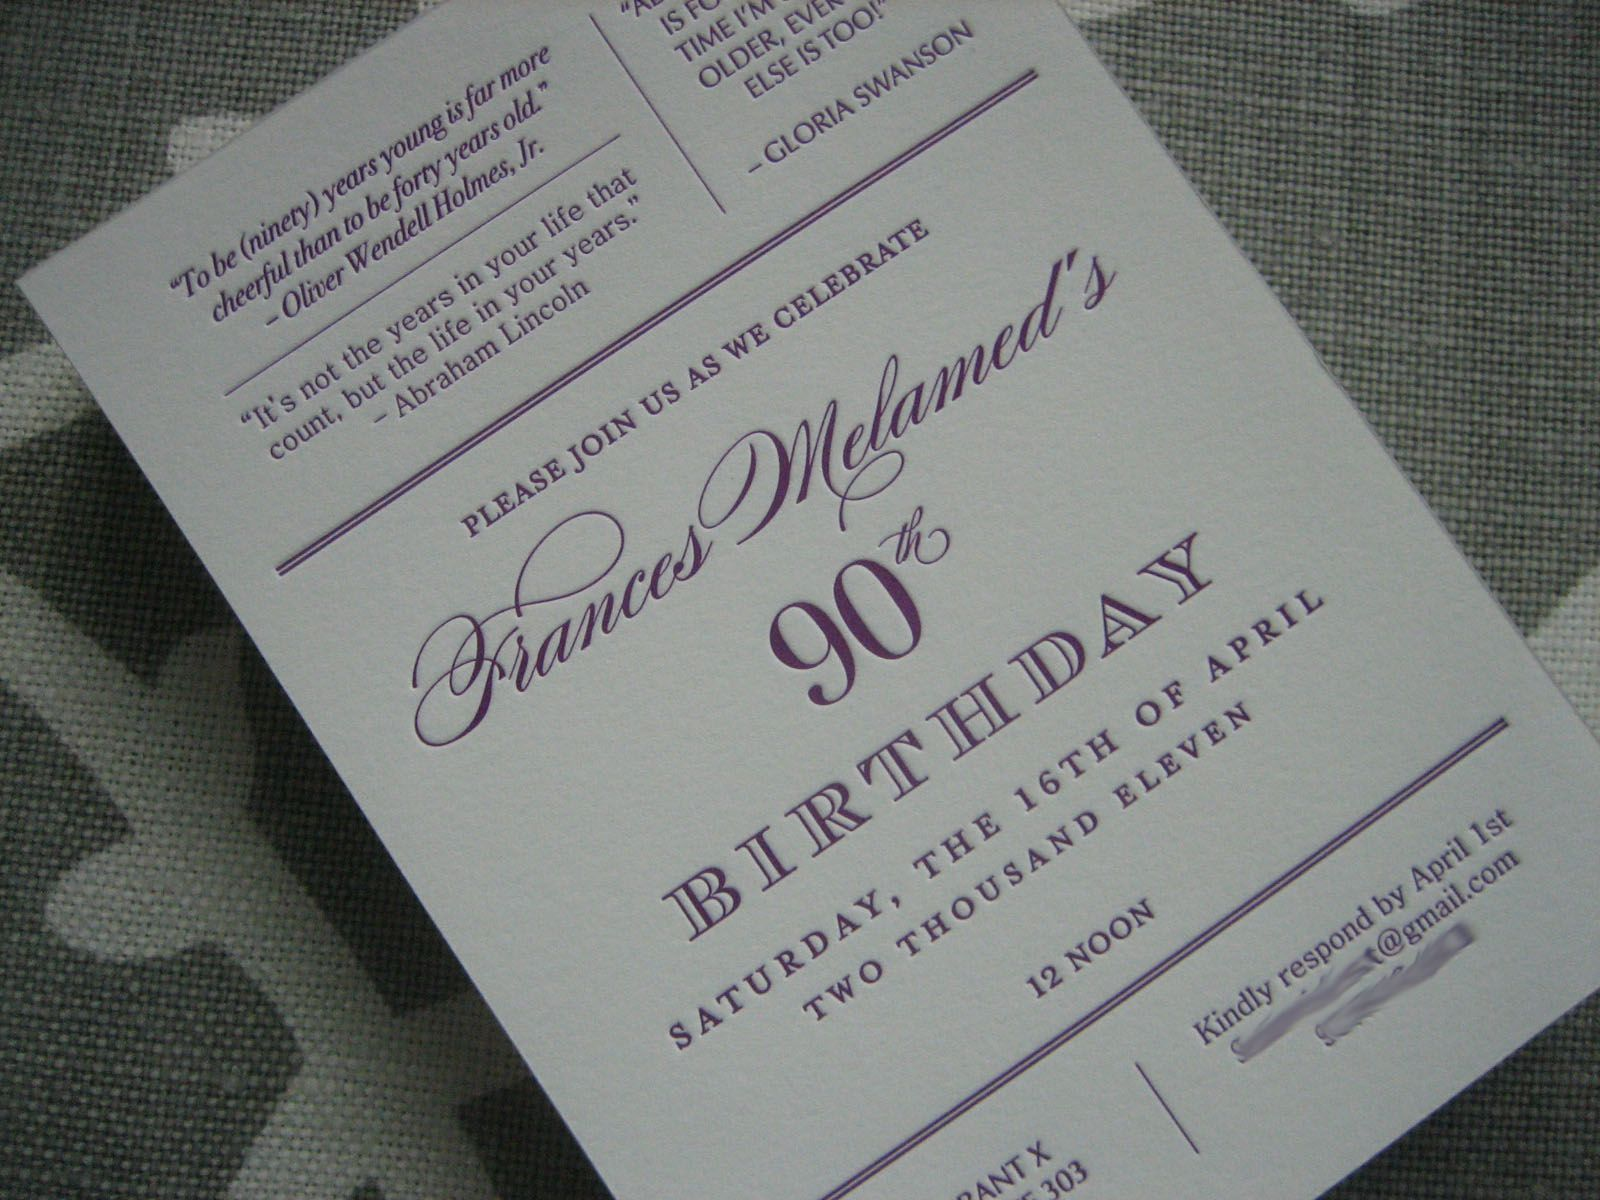 Navy bean letterpress 90th birthday invitations parties navy bean letterpress 90th birthday invitations filmwisefo Images